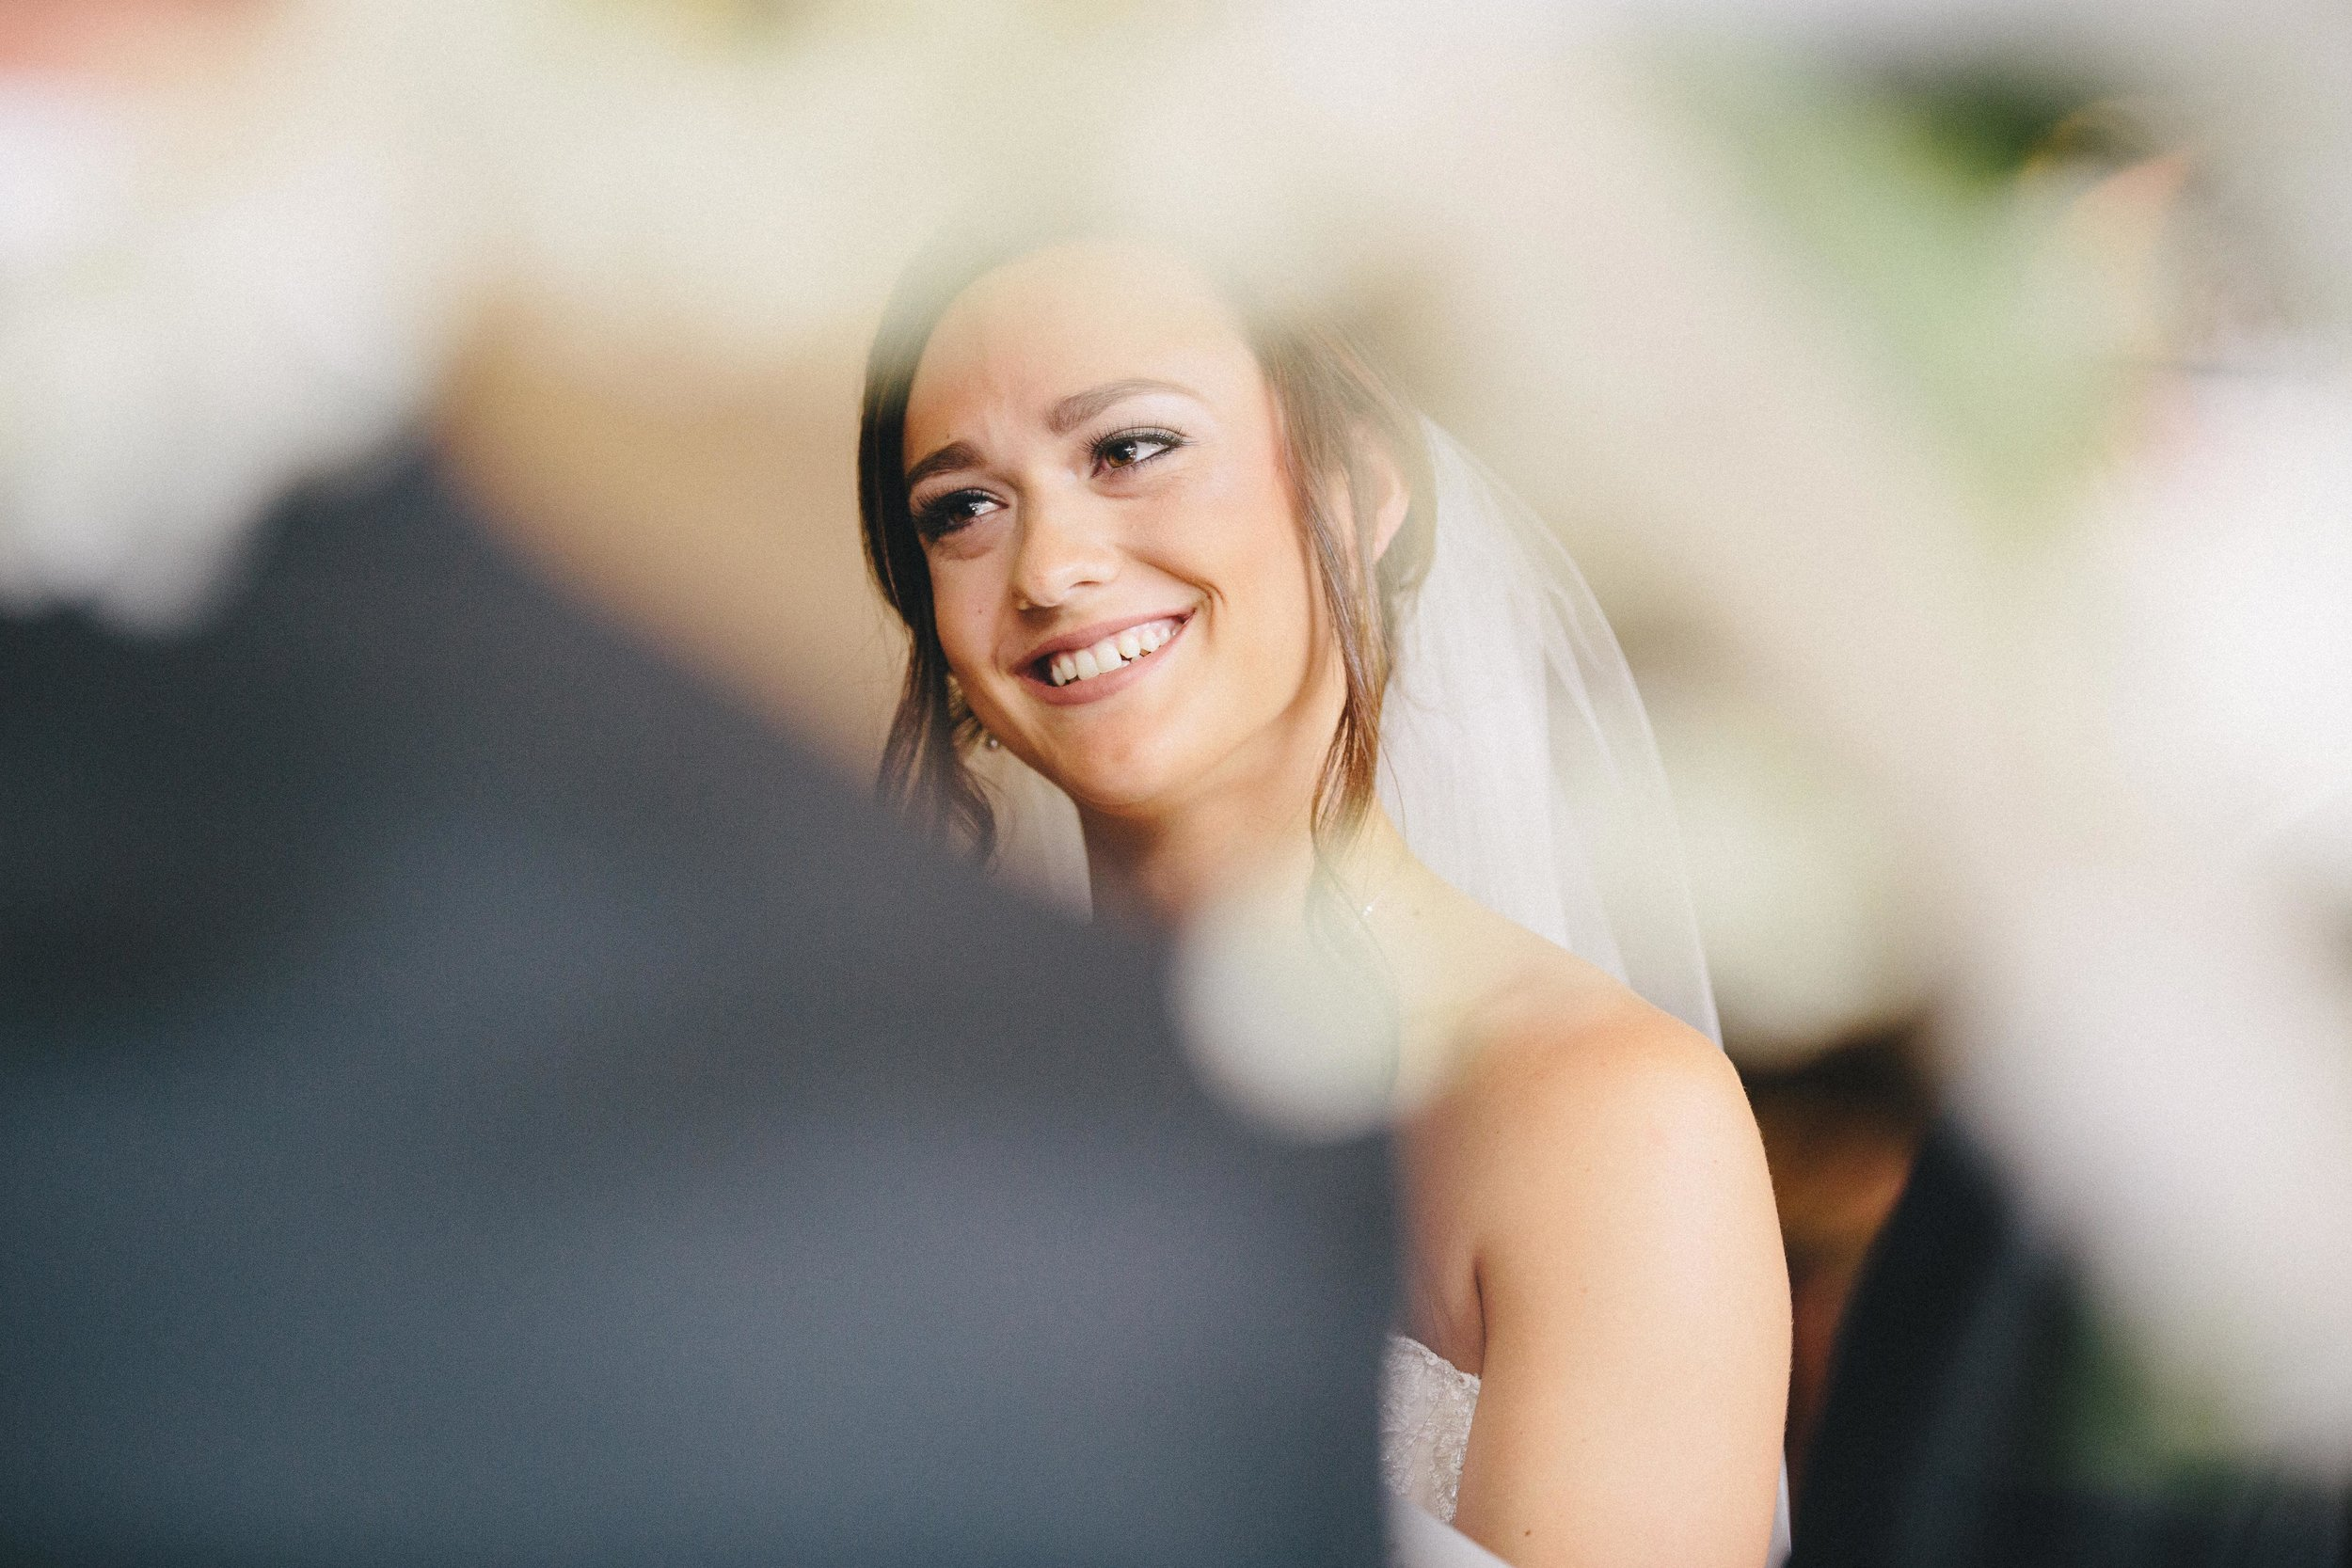 MP_16.06.12_Zach-&-Katlyn-Wedding-3329.jpg